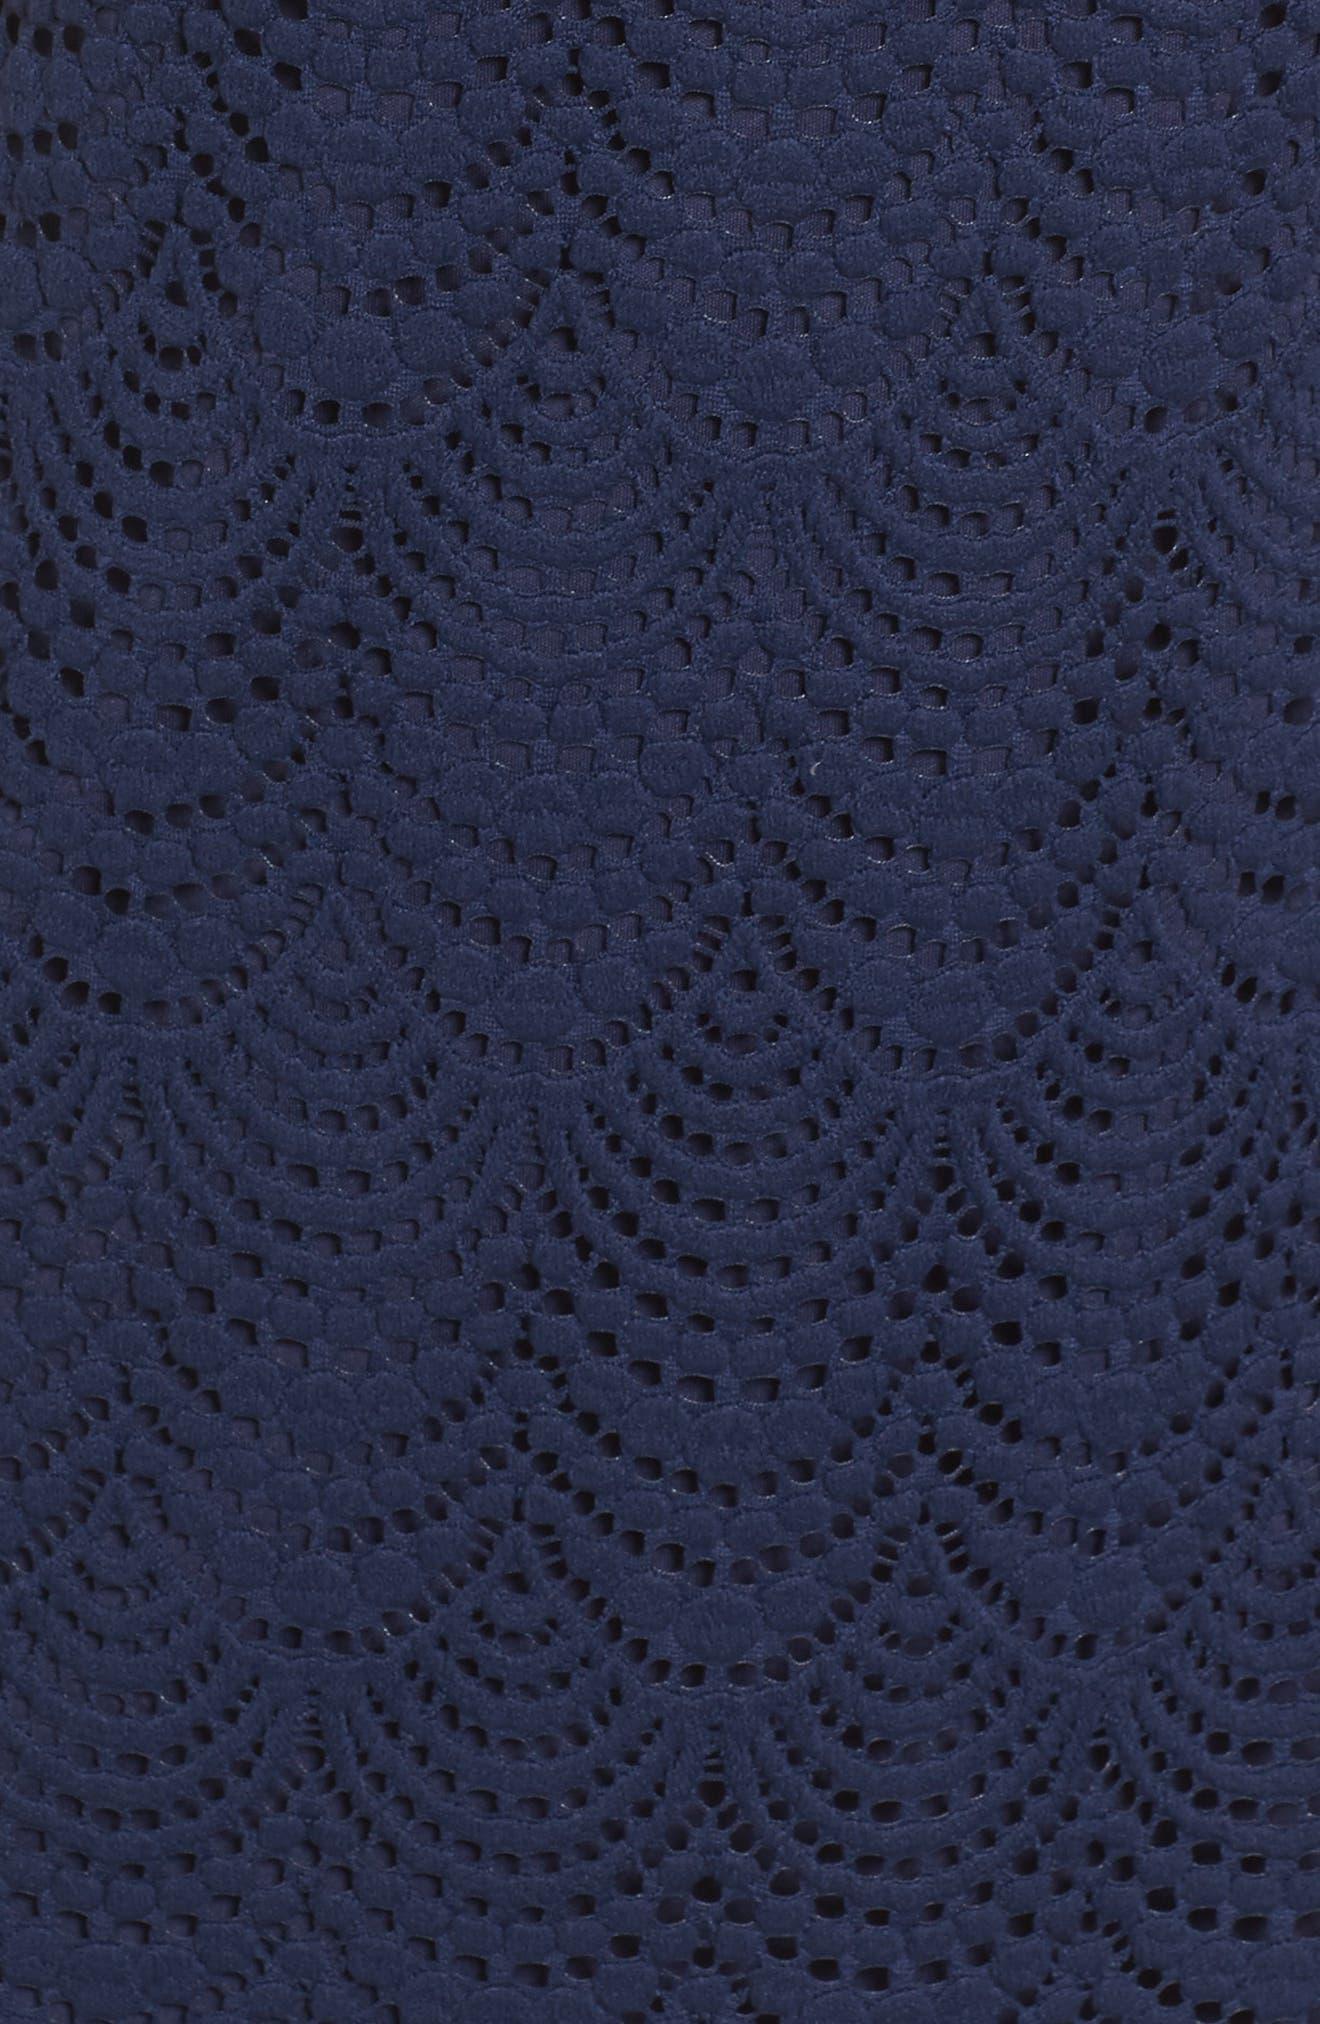 Jade Lace Off the Shoulder Dress,                             Alternate thumbnail 5, color,                             408